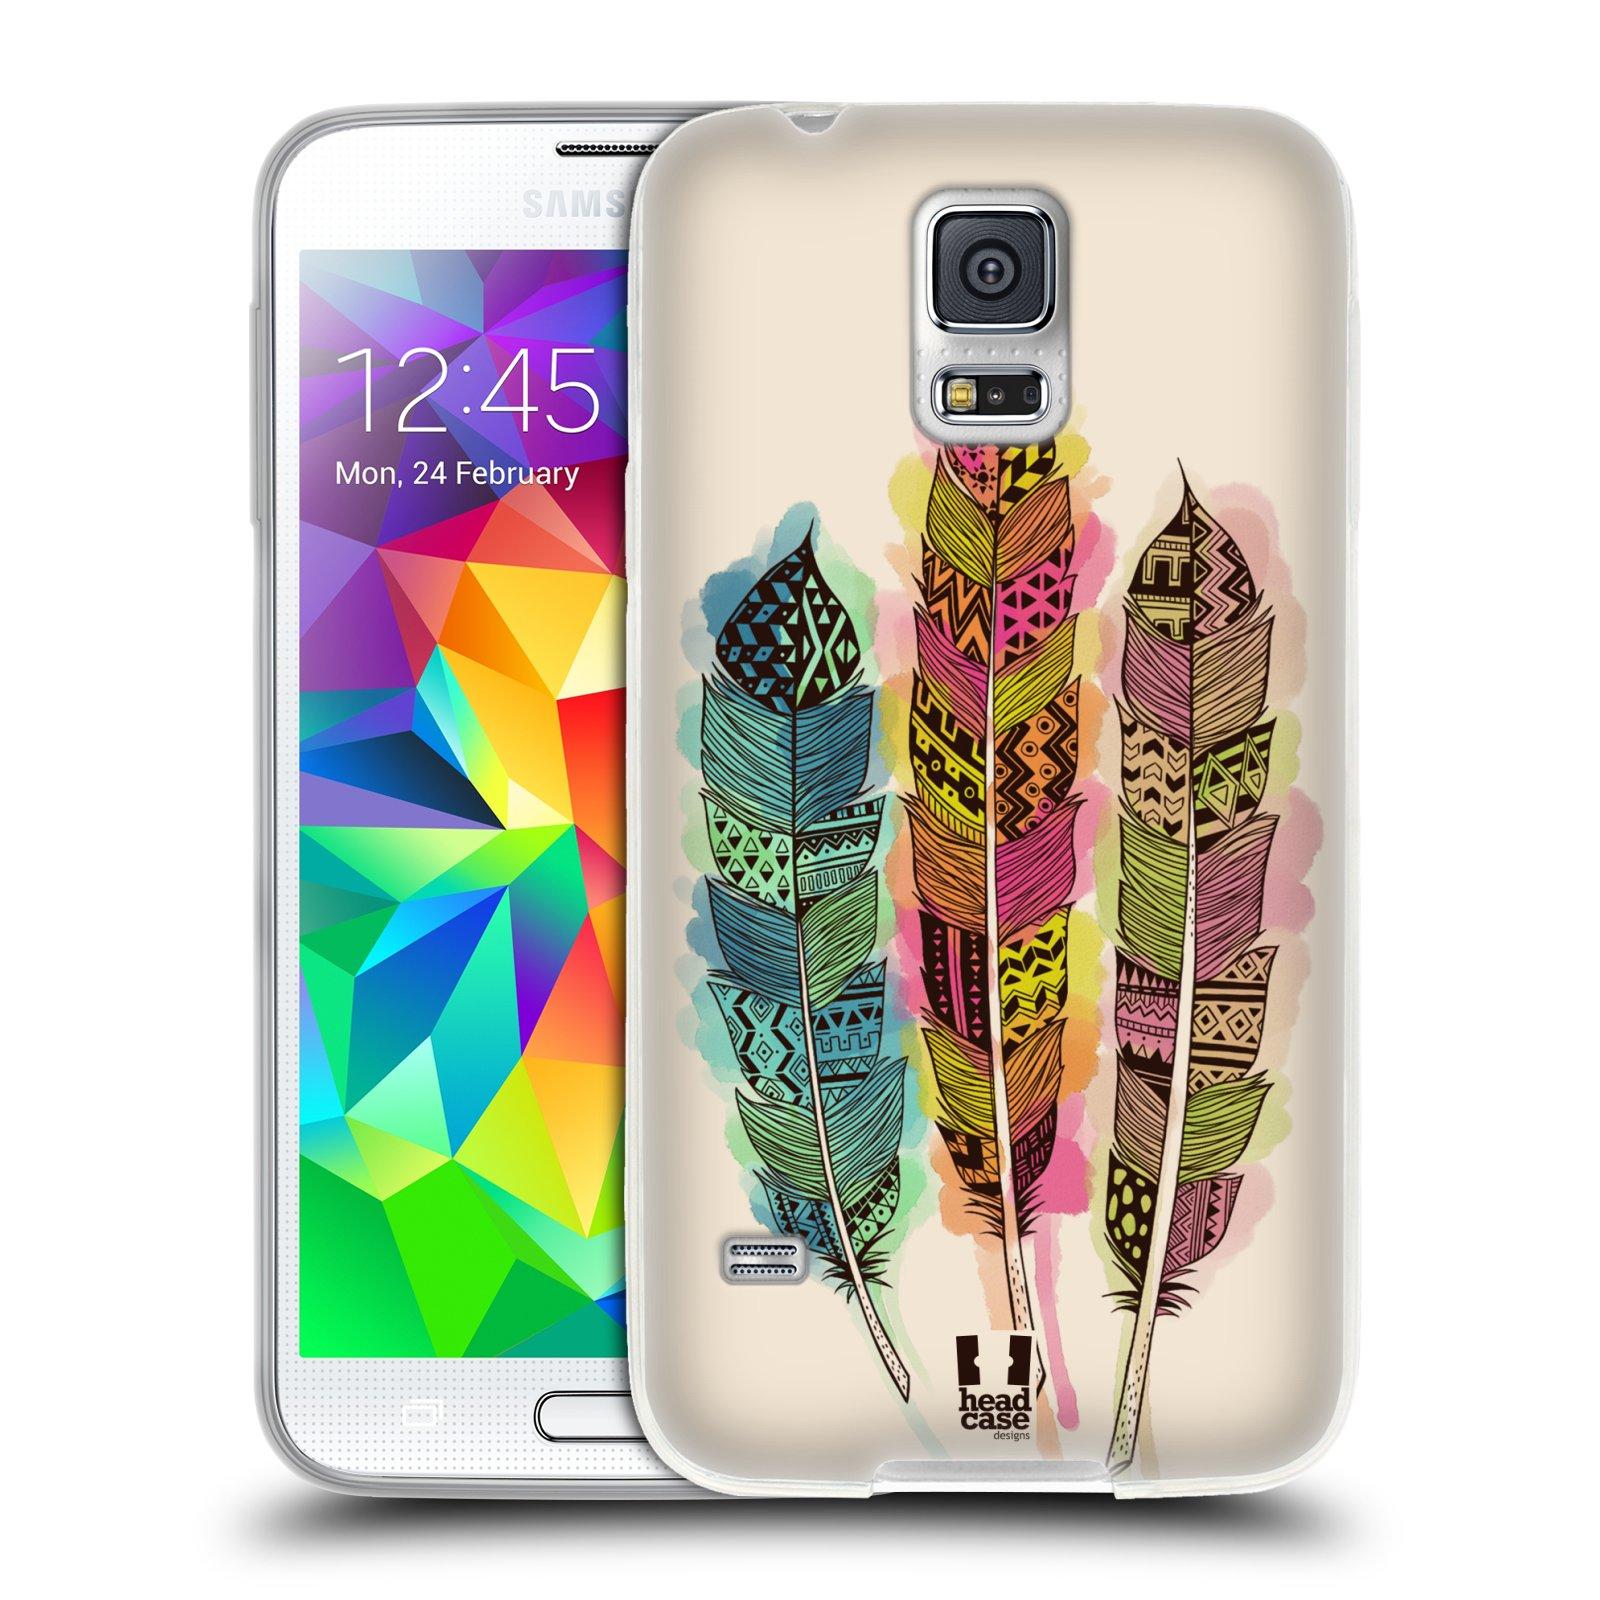 Silikonové pouzdro na mobil Samsung Galaxy S5 HEAD CASE AZTEC PÍRKA SPLASH